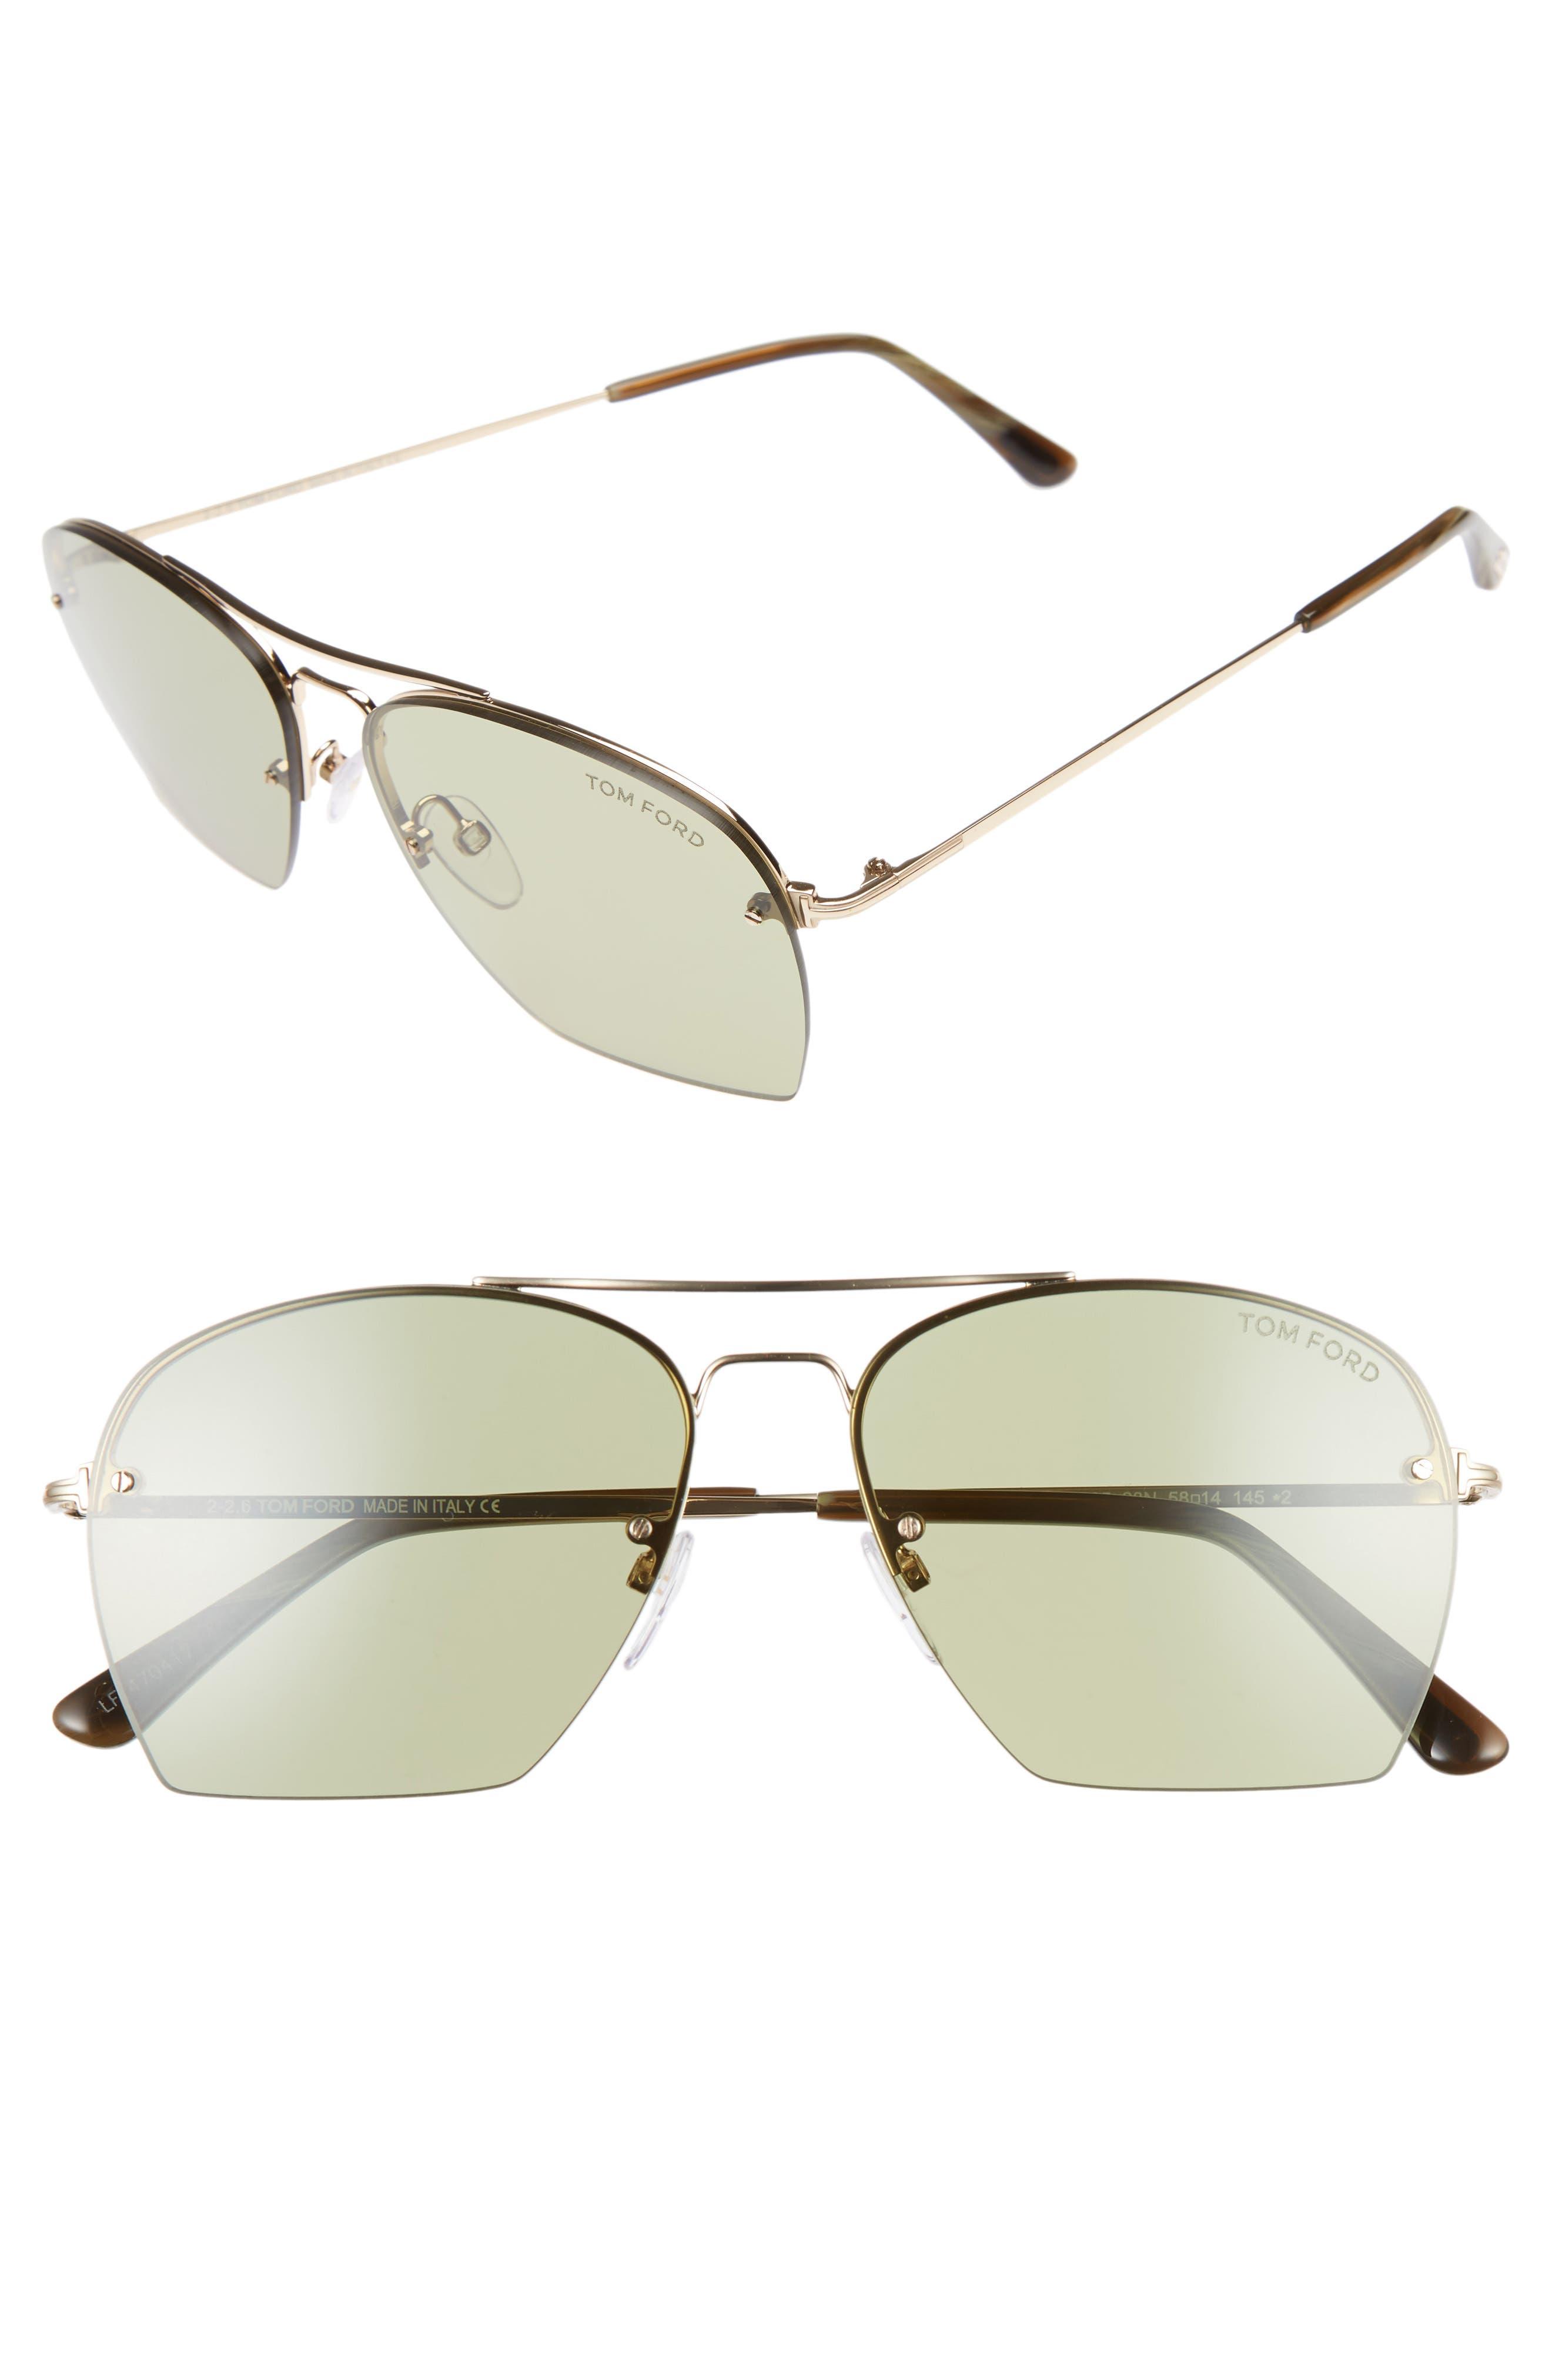 Tom Ford Whelan 58mm Aviator Sunglasses